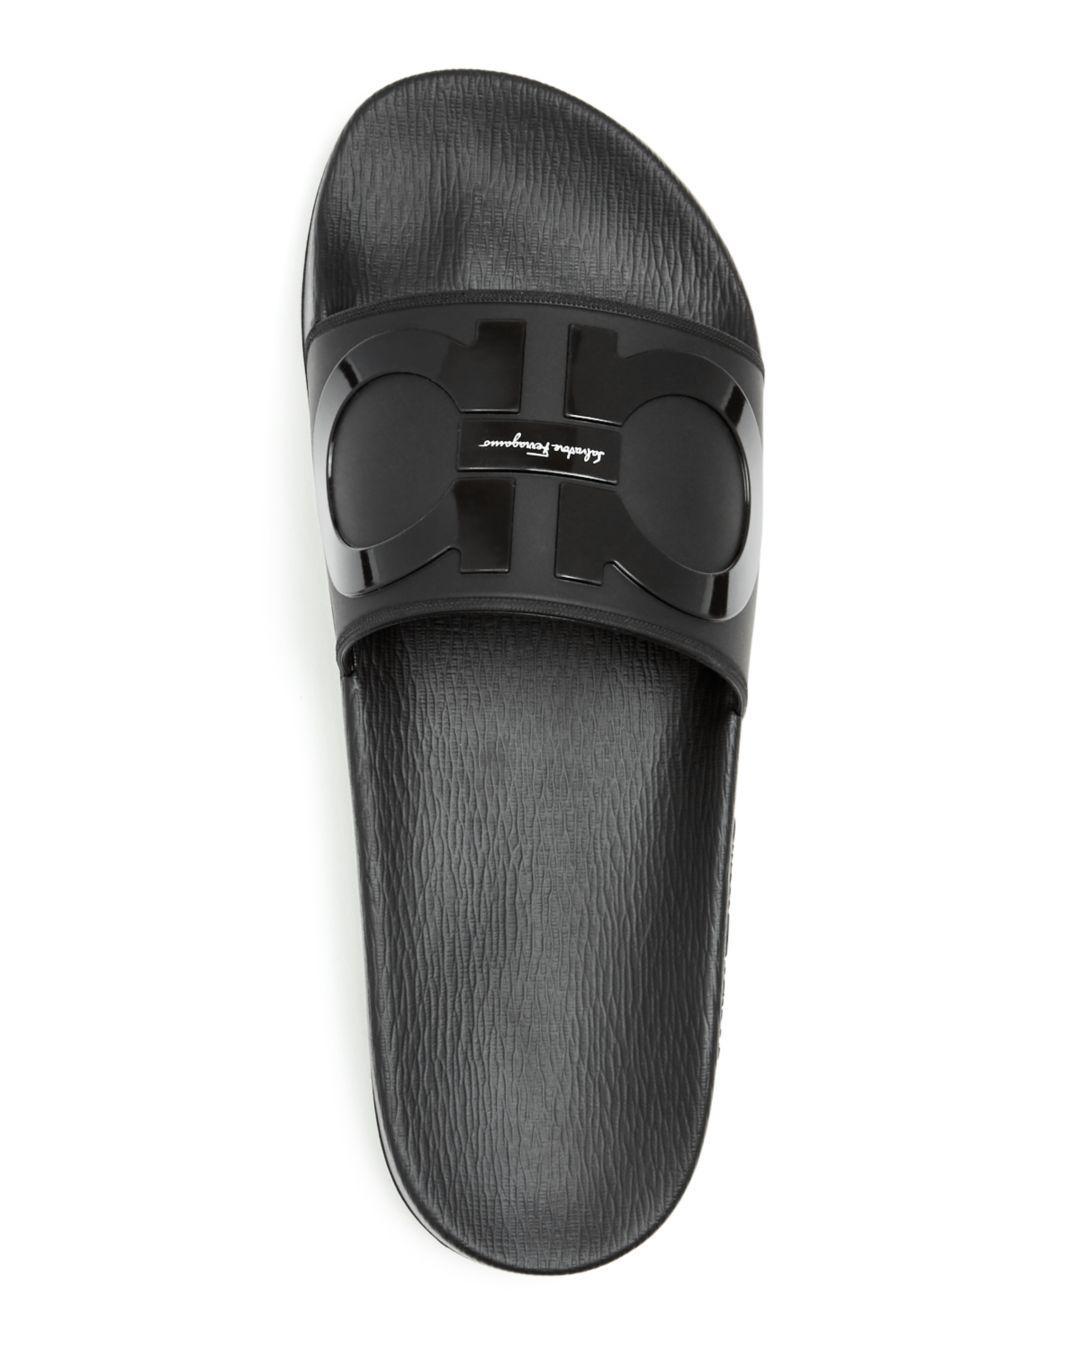 518b73304 Ferragamo - Black Men's Groove 2 Original Double Gancini Slide Sandals for  Men - Lyst. View fullscreen